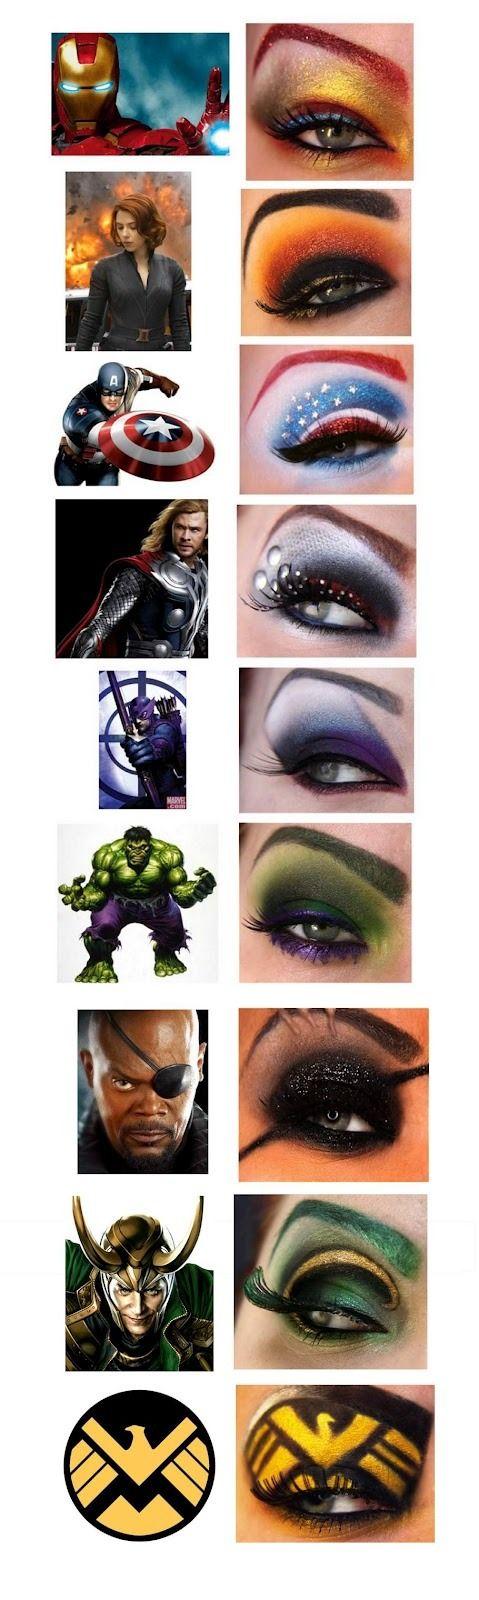 Awesome Avengers themed makeup!Avengers Eye, Eye Makeup, Eye Shadows, Makeup Ideas, Eyeshadows, Super Heroes, Eyemakeup, The Avengers, Superhero